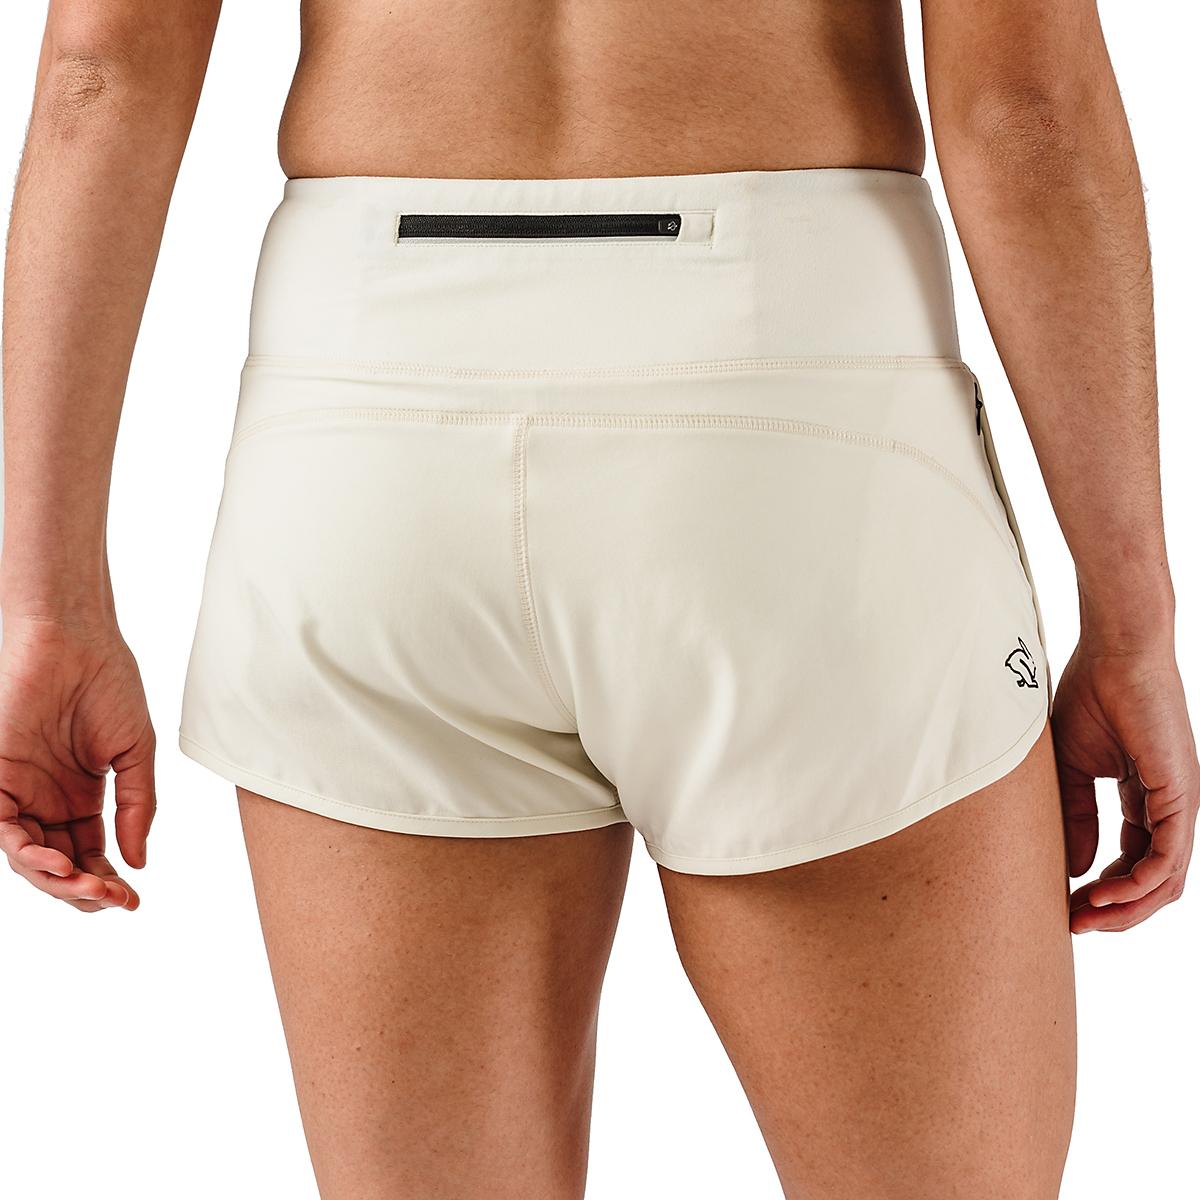 "Women's Rabbit Pocket Shorts 2.5"" - Color: Vanilla Ice - Size: XS, Vanilla Ice, large, image 2"